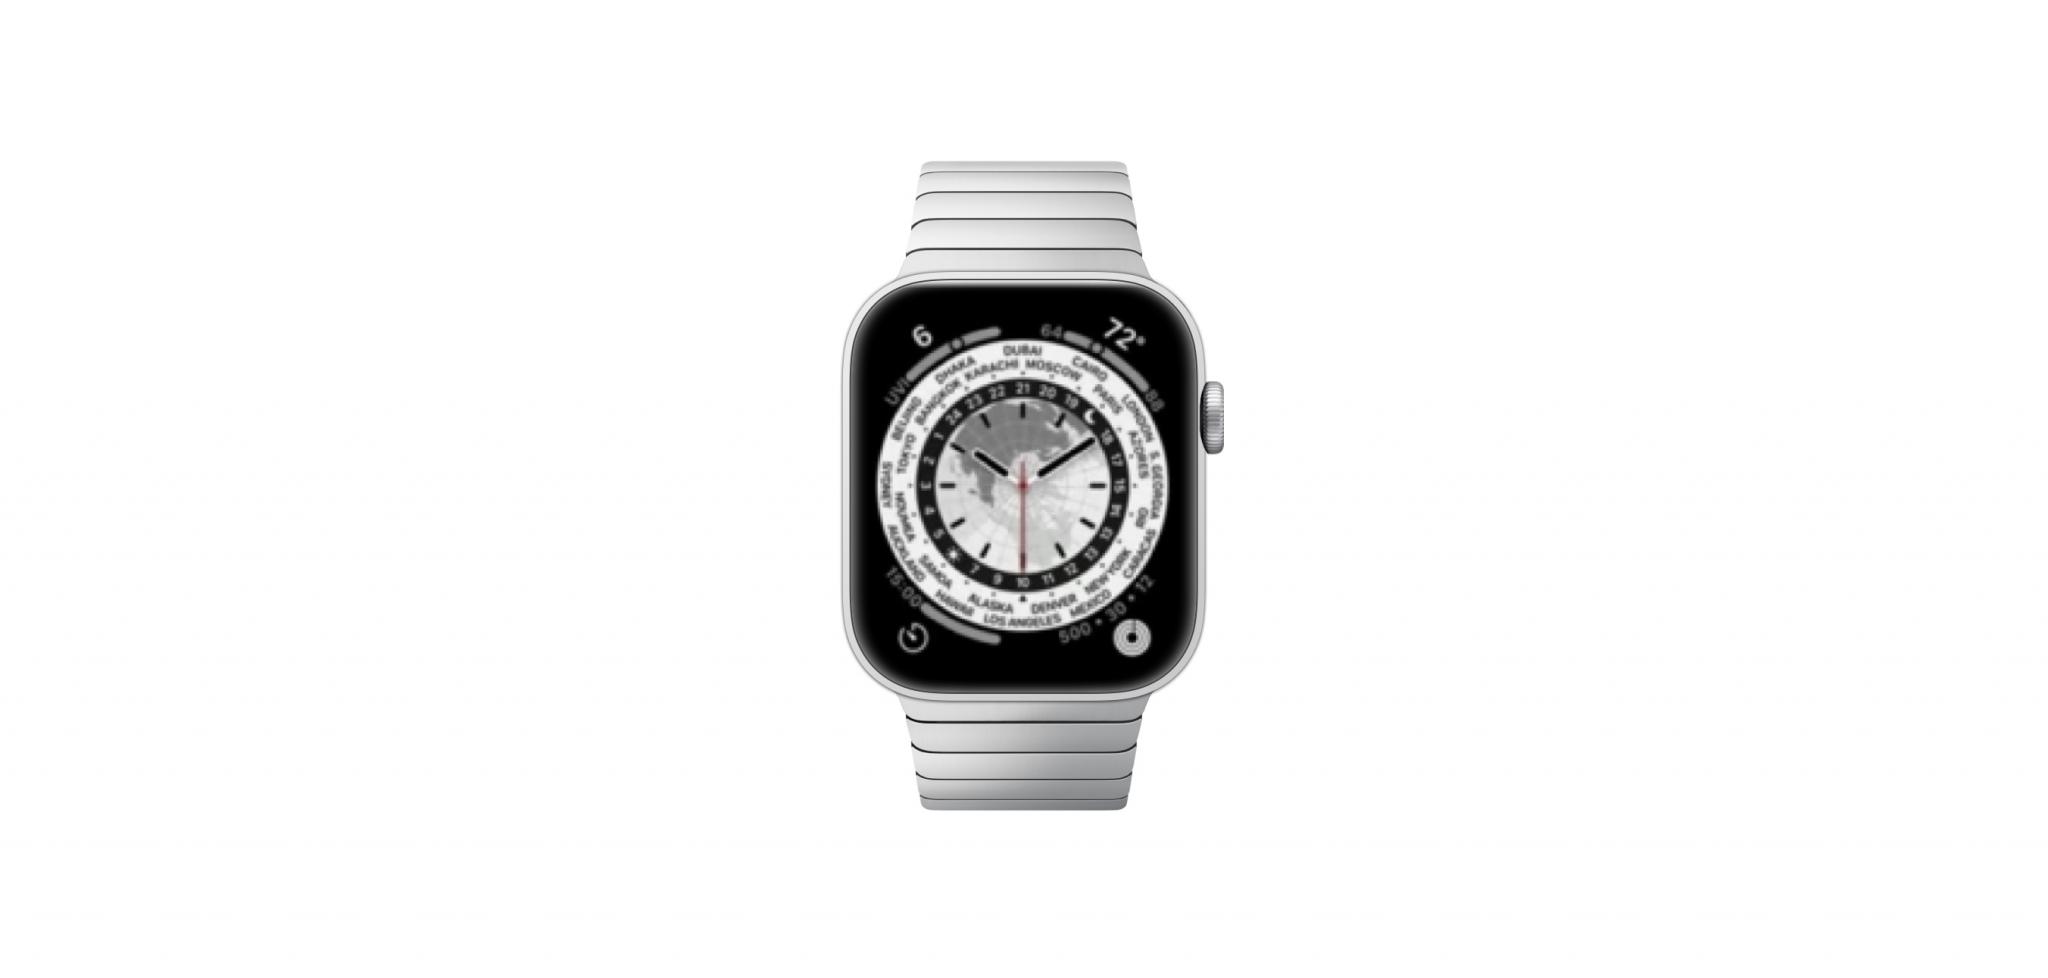 Mockup des Atlas Watchface der Apple Watch Series 7